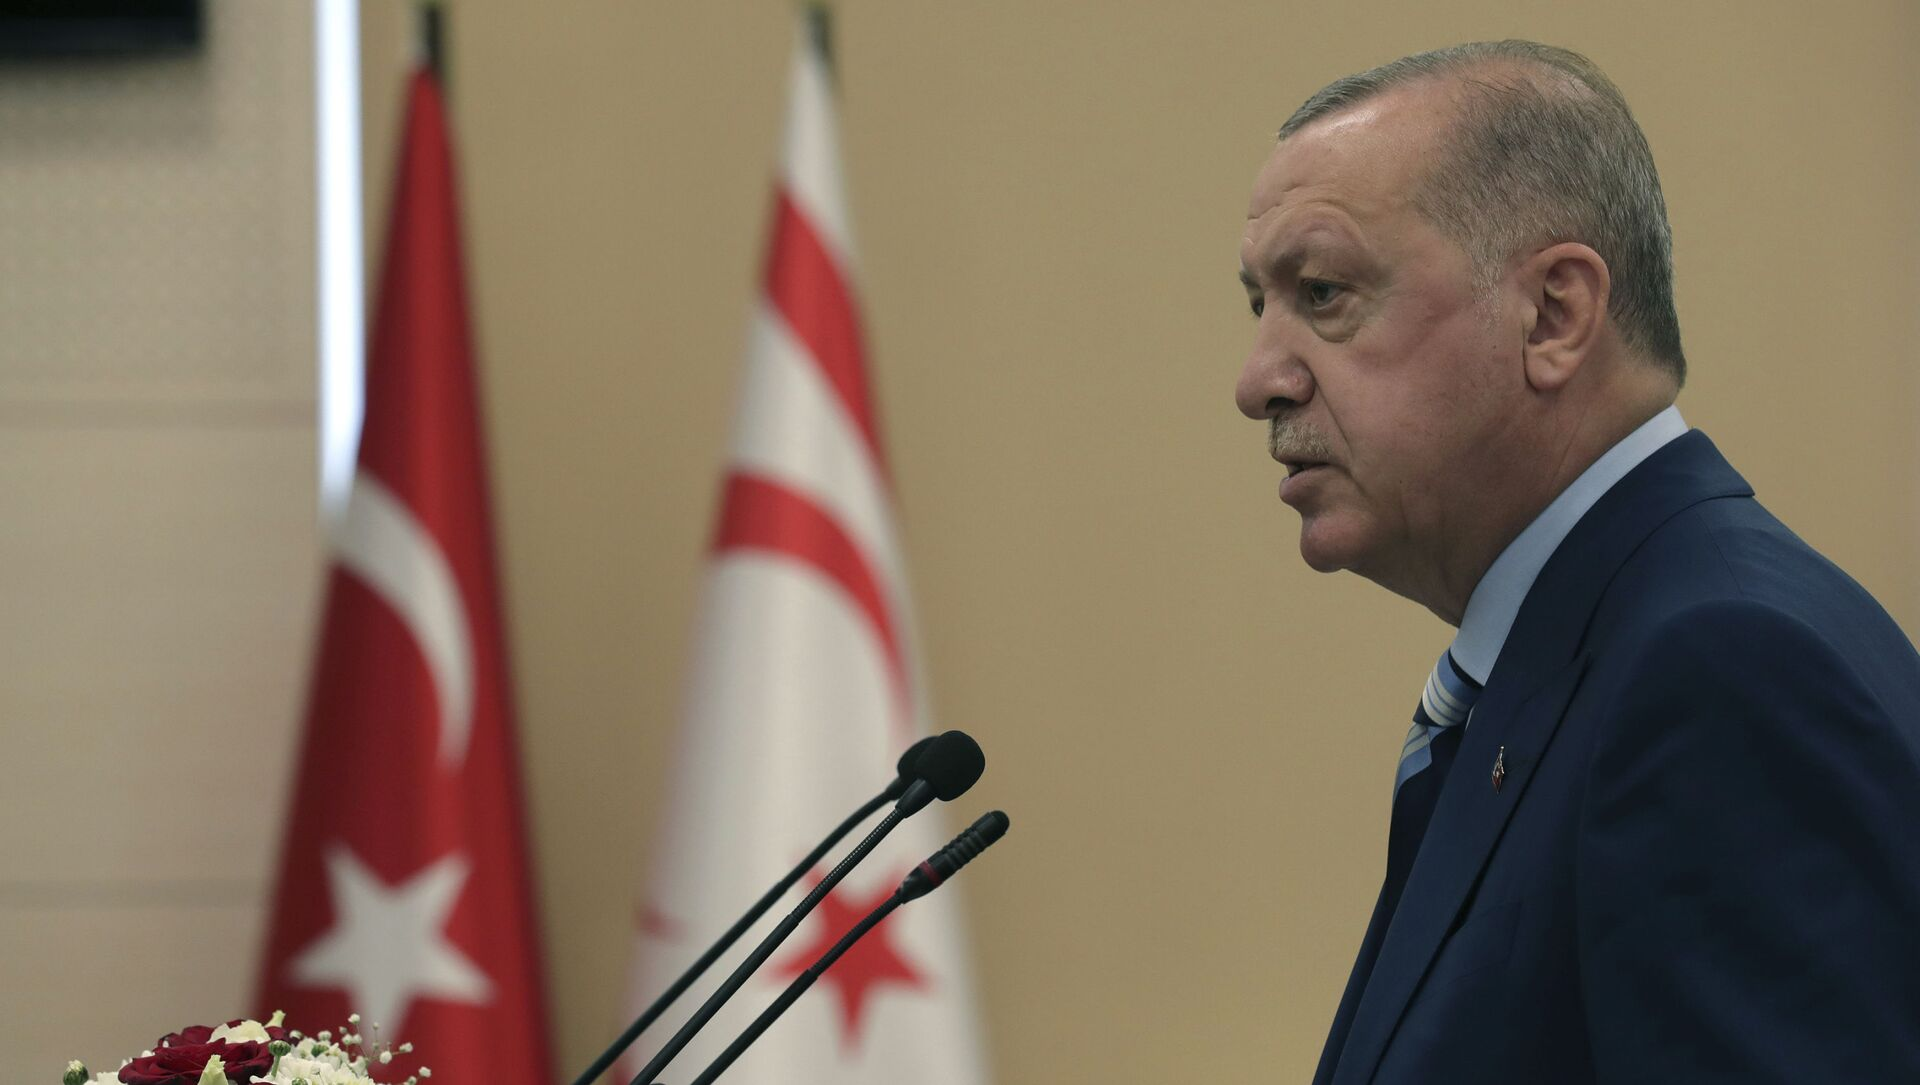 Президент Турции Реджеп Тайип Эрдоган, фото из архива - Sputnik Azərbaycan, 1920, 29.08.2021